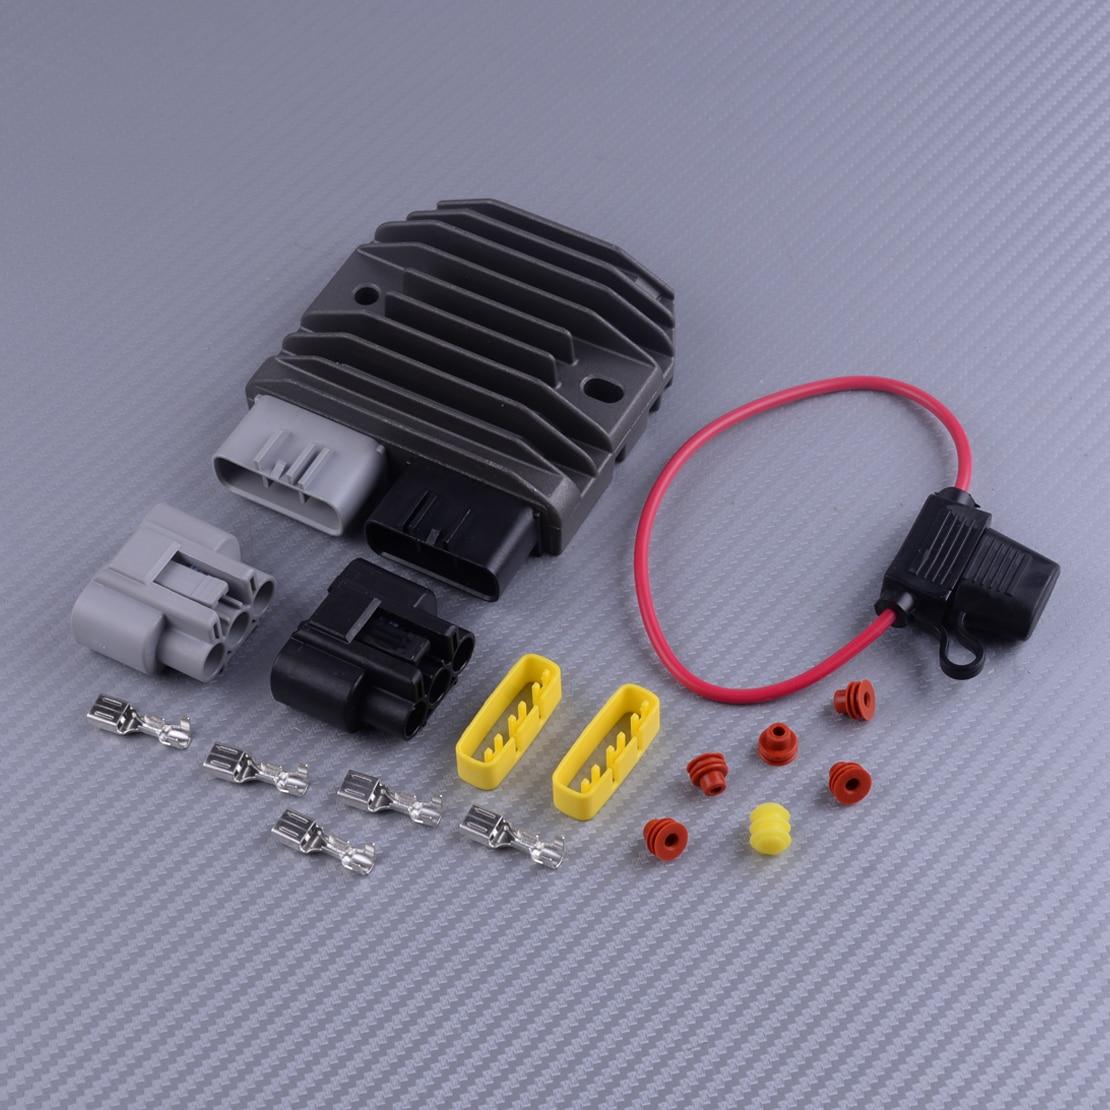 DWCX Universal MOSFET regulador rectificador actualización Kit accesorios para SHINDENGEN FH012AA fusible Maxi protegido